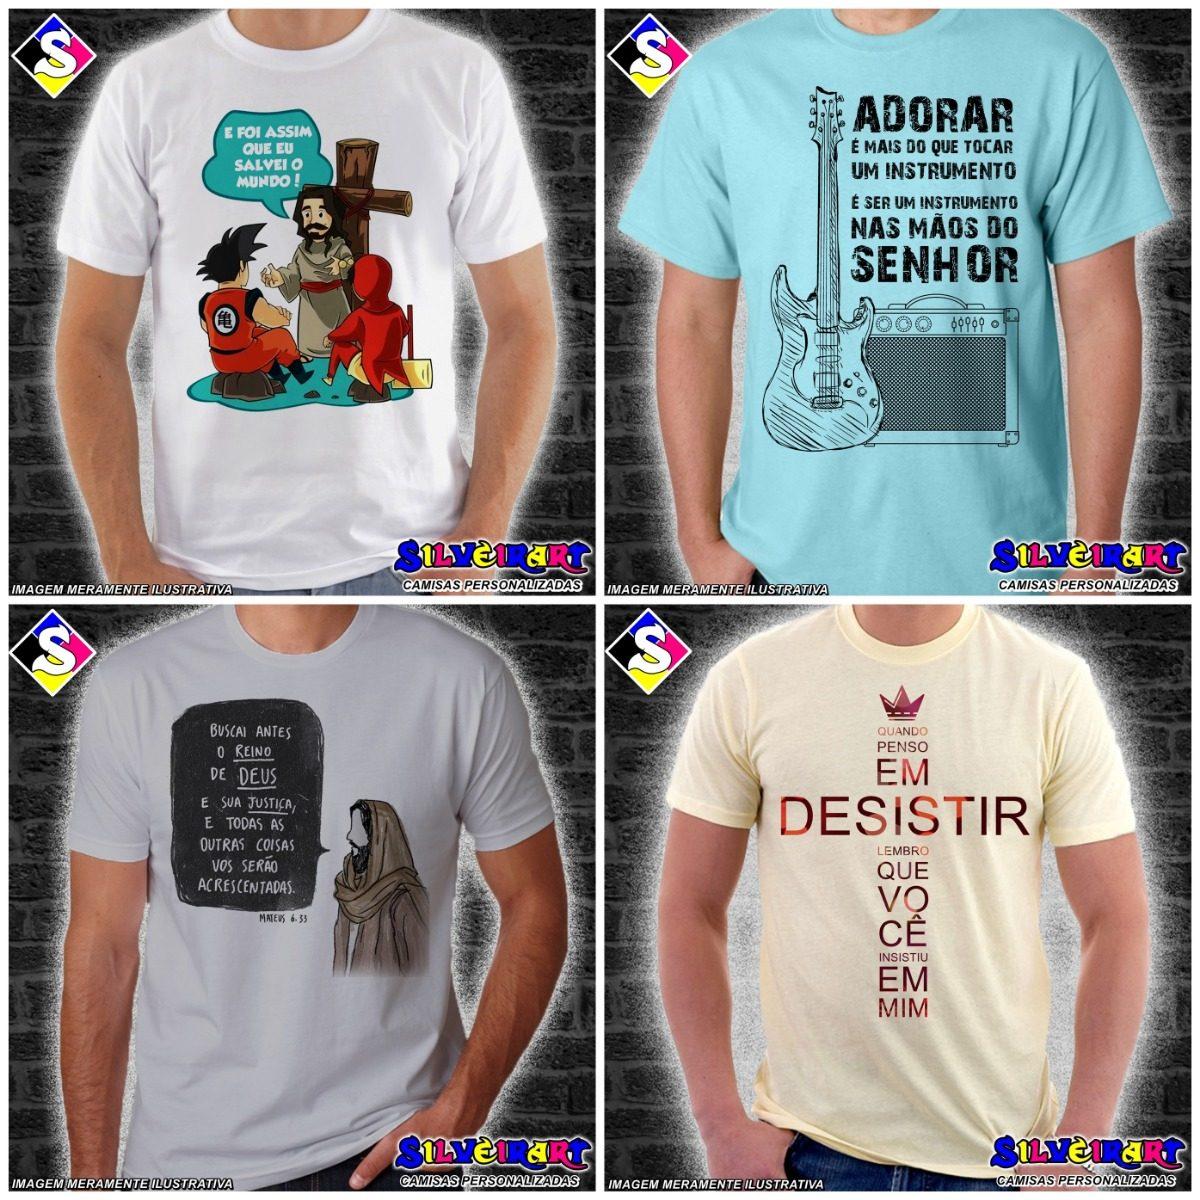 cc12f3c8c3d55 Kit 10 Camisas Gospel Personalizadas - Silveirart - R$ 250,00 em ...